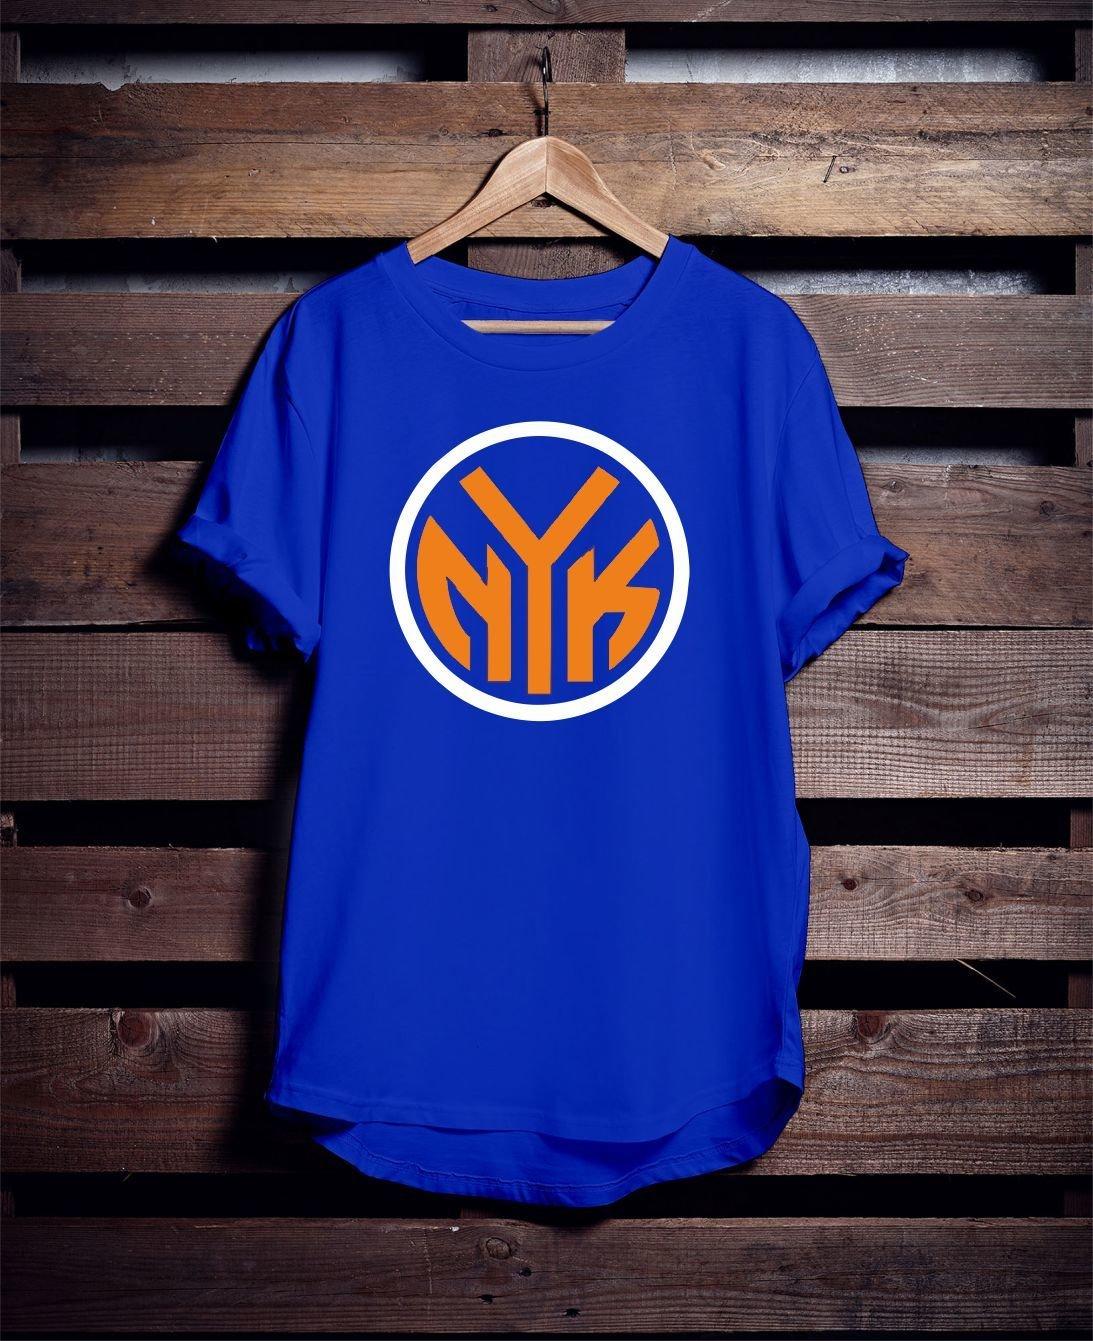 NYΚ t-shirts 270